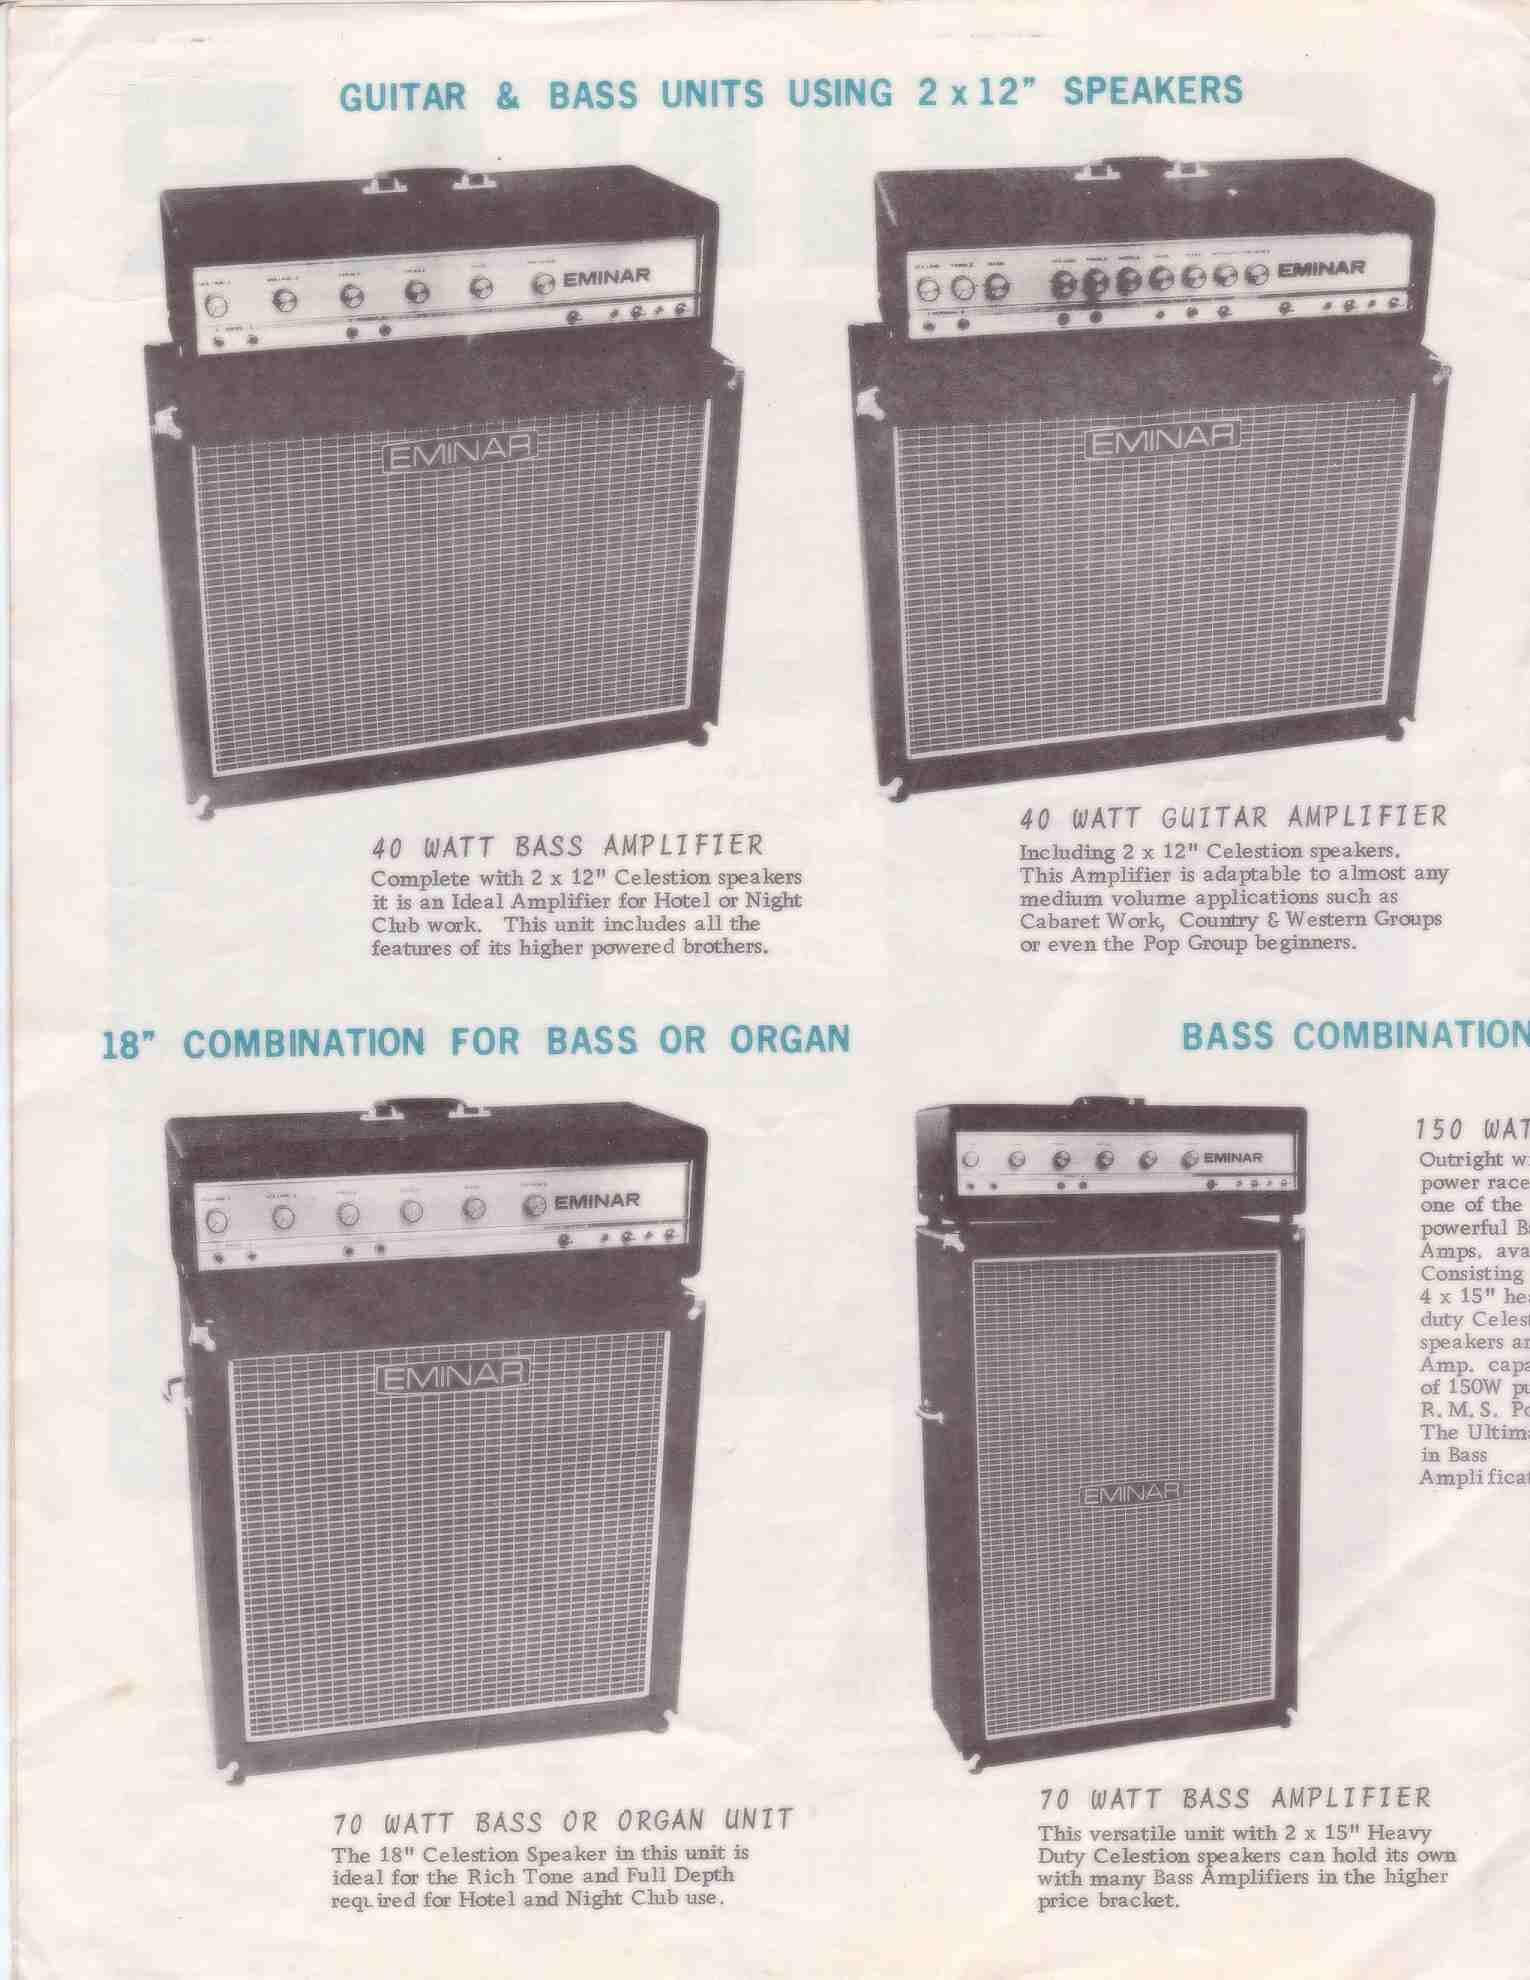 Eminar 60w Bass Amplifier Catalogue Page 1 132kb